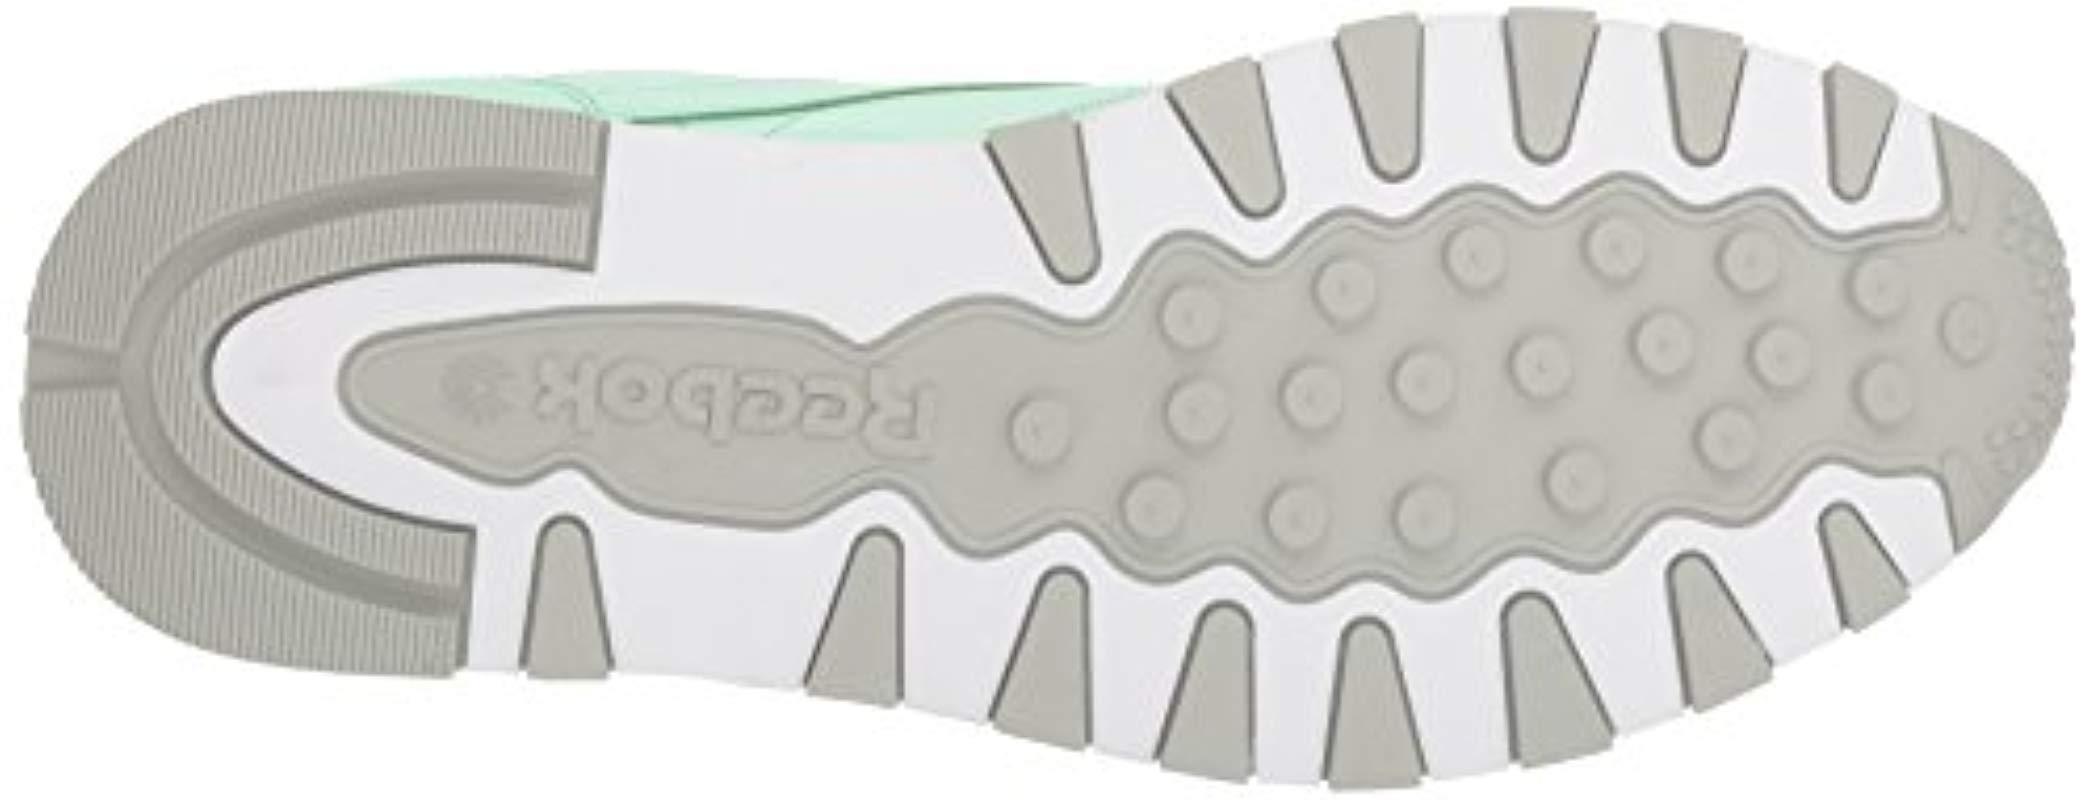 bba6279bbaf52 Reebok - Classic Leather Walking Shoe Digi-digital Green white 5 M Us for.  View fullscreen